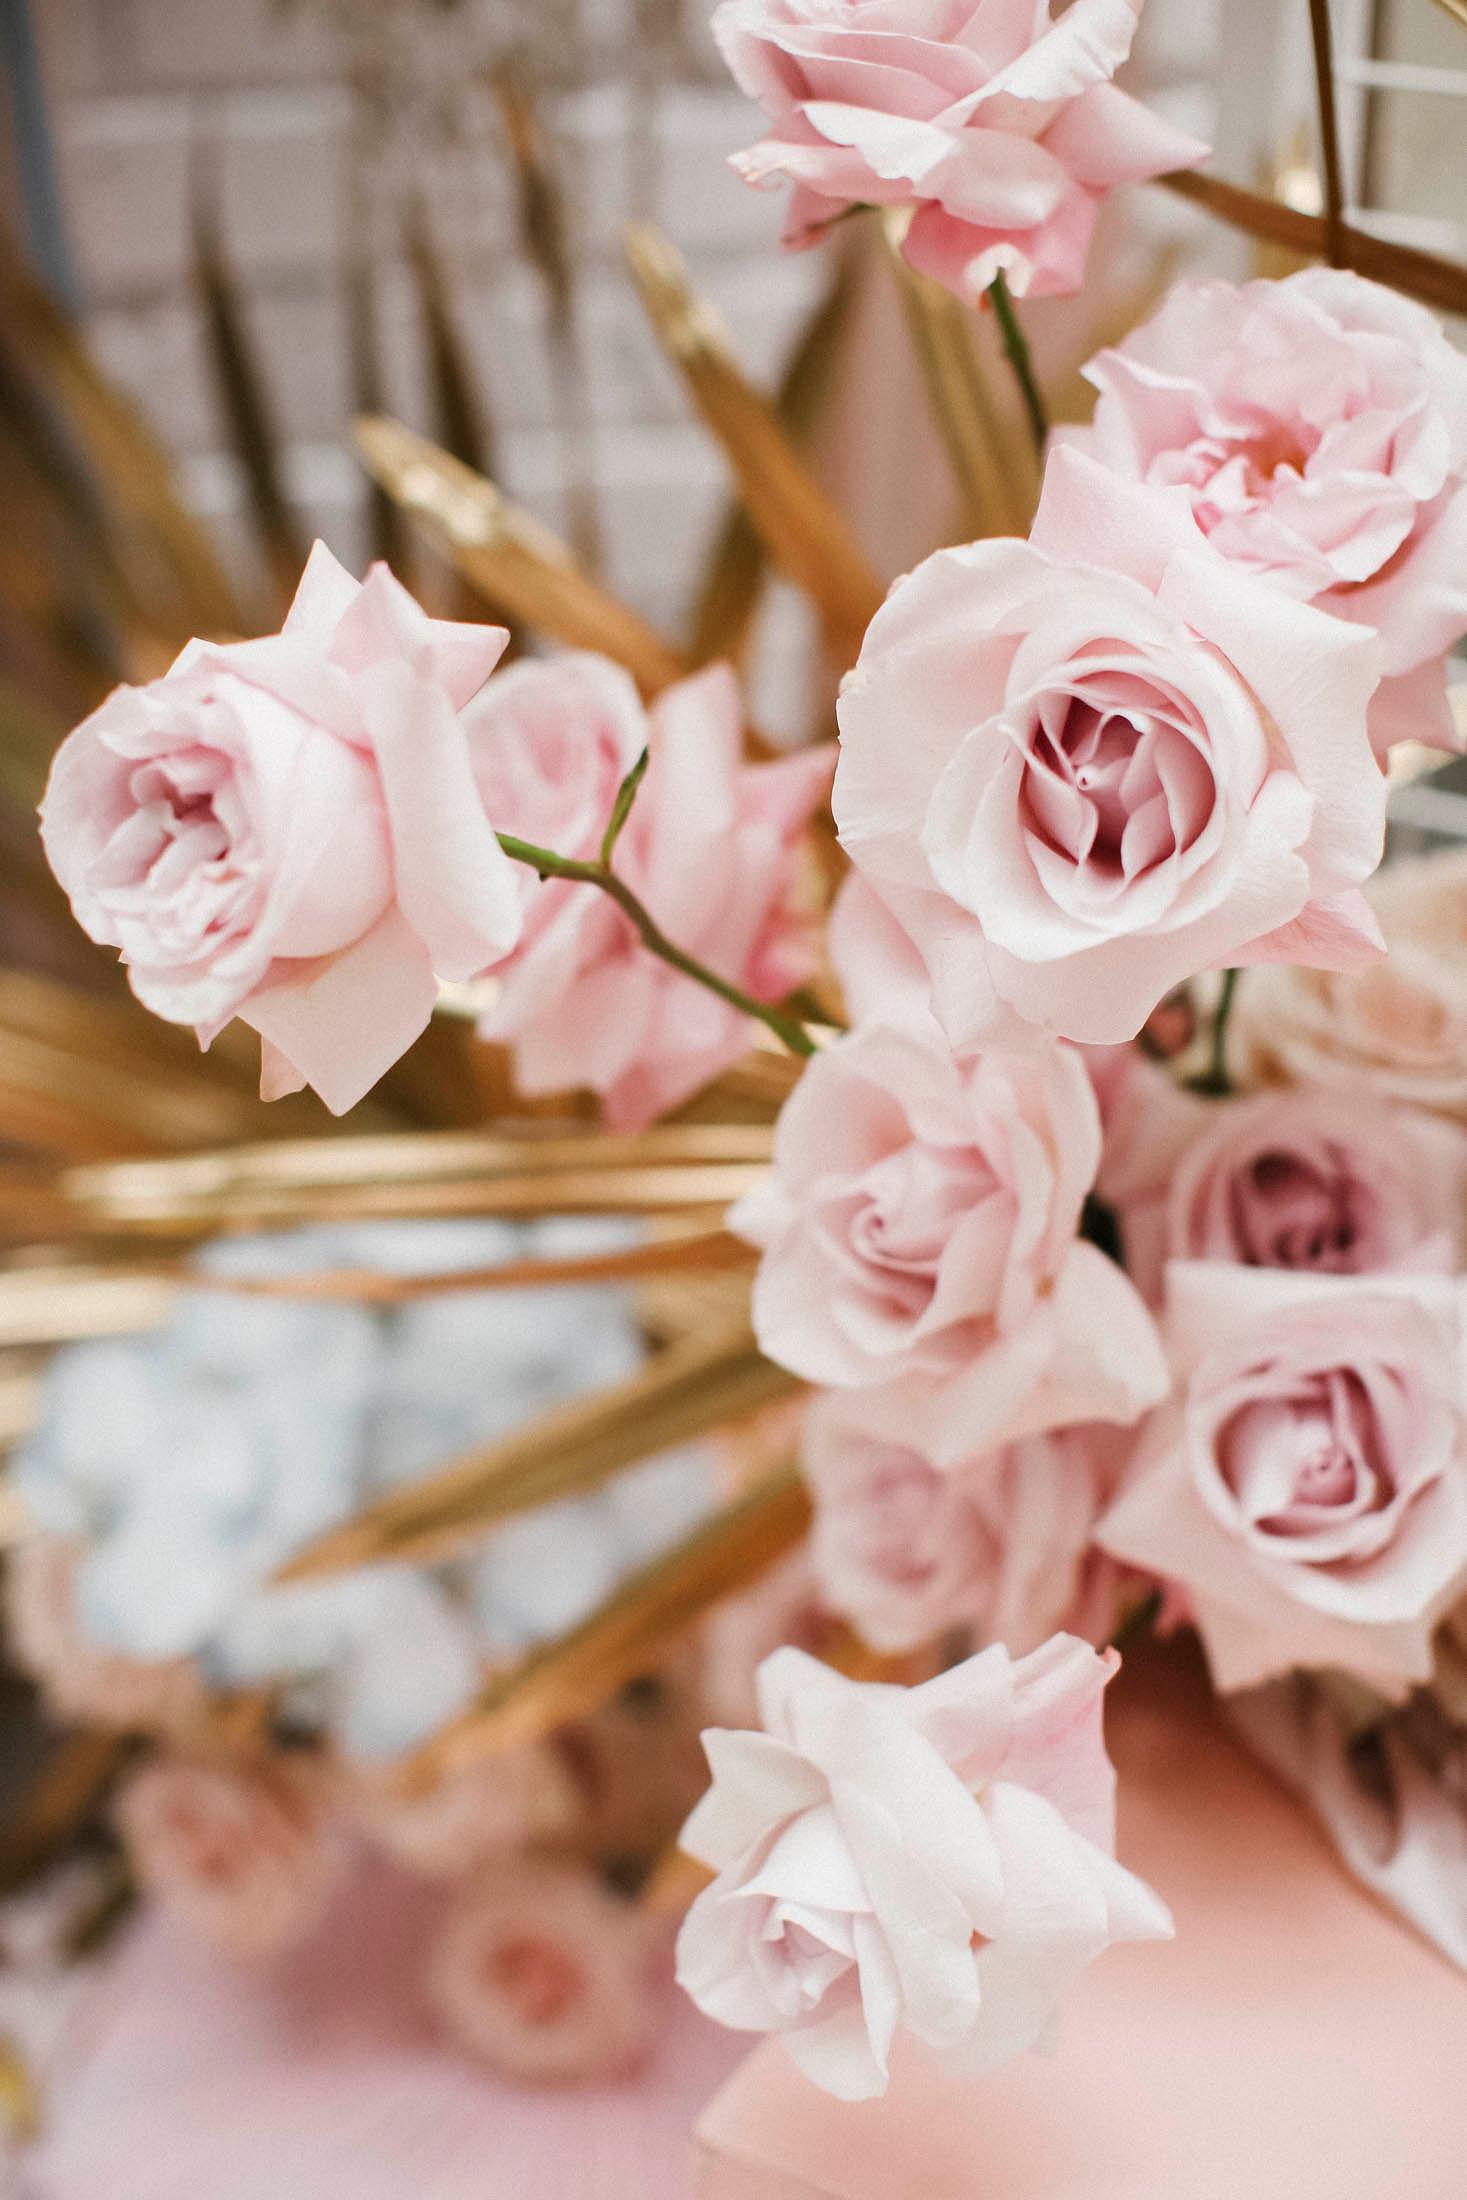 Lara + Cass Bohemian Blooms juliet's bedroom rose closeup